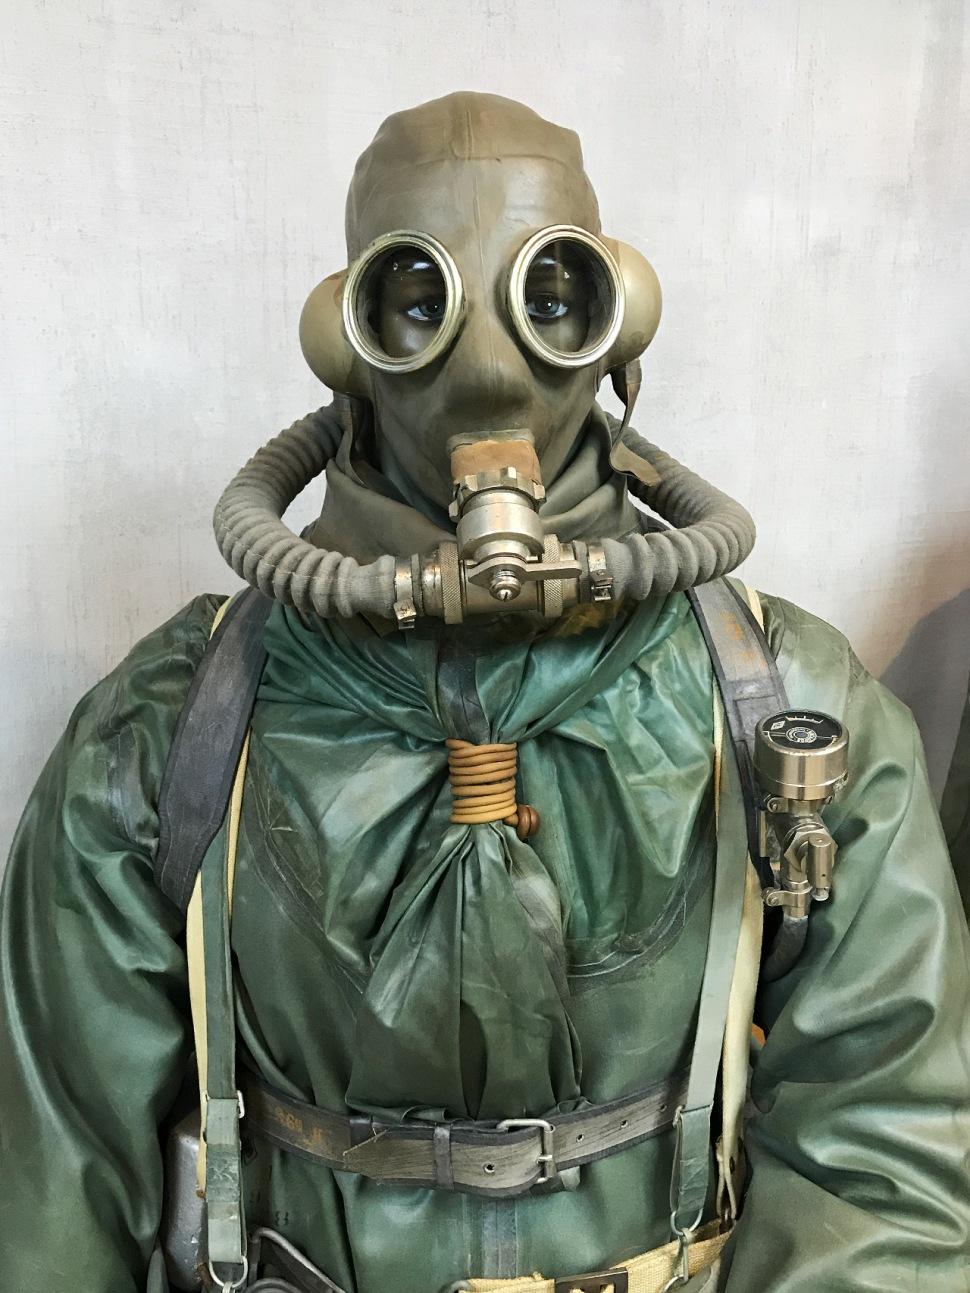 180627-panerai-gtg-moscow-paneristi-club-room-rebreather-IPSA